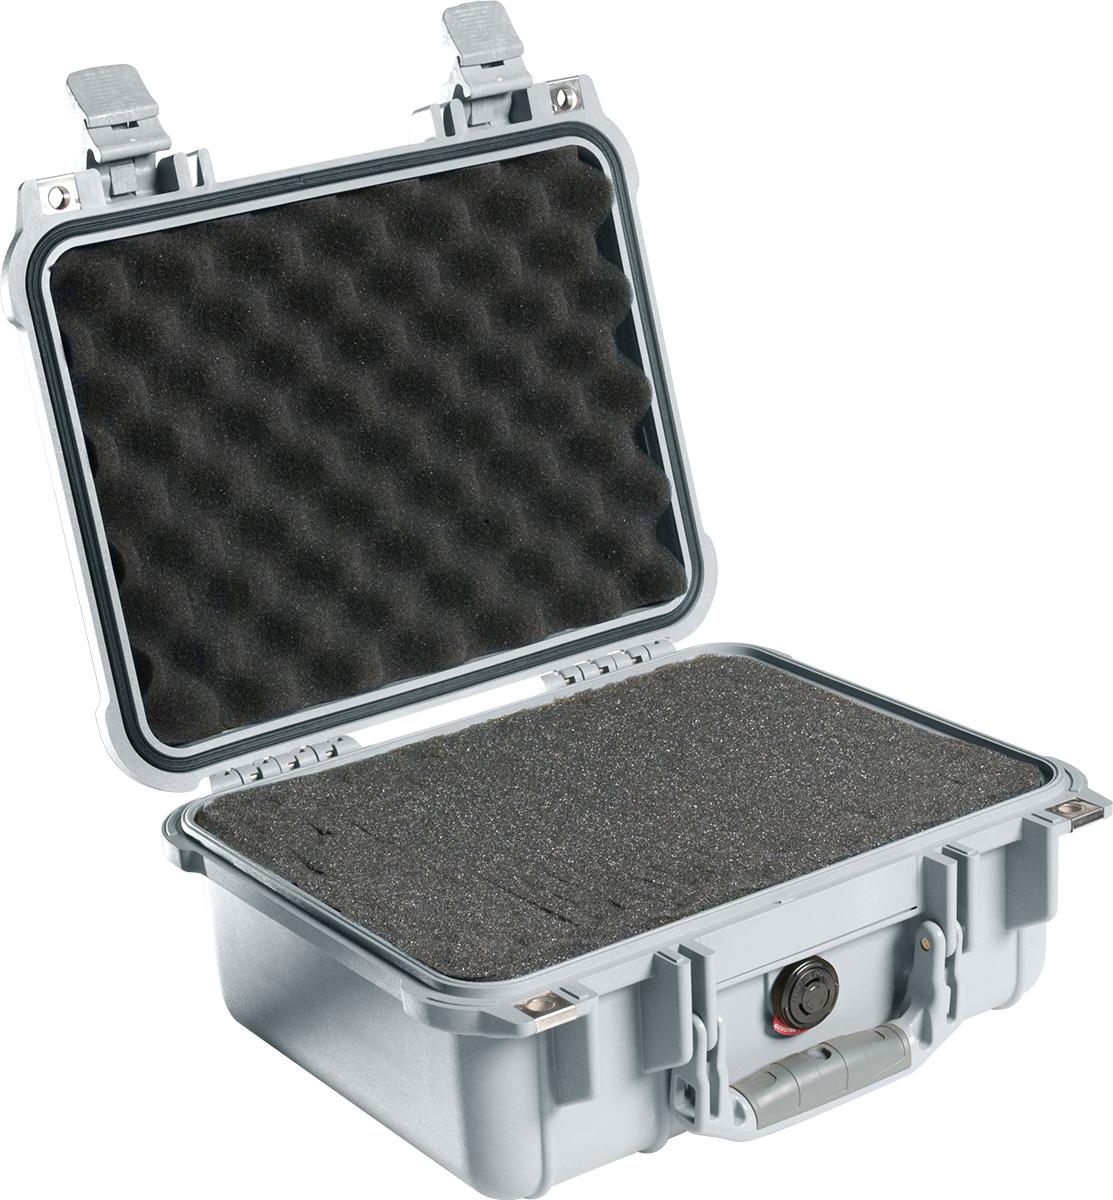 pelican 1400 silver protector rugged case